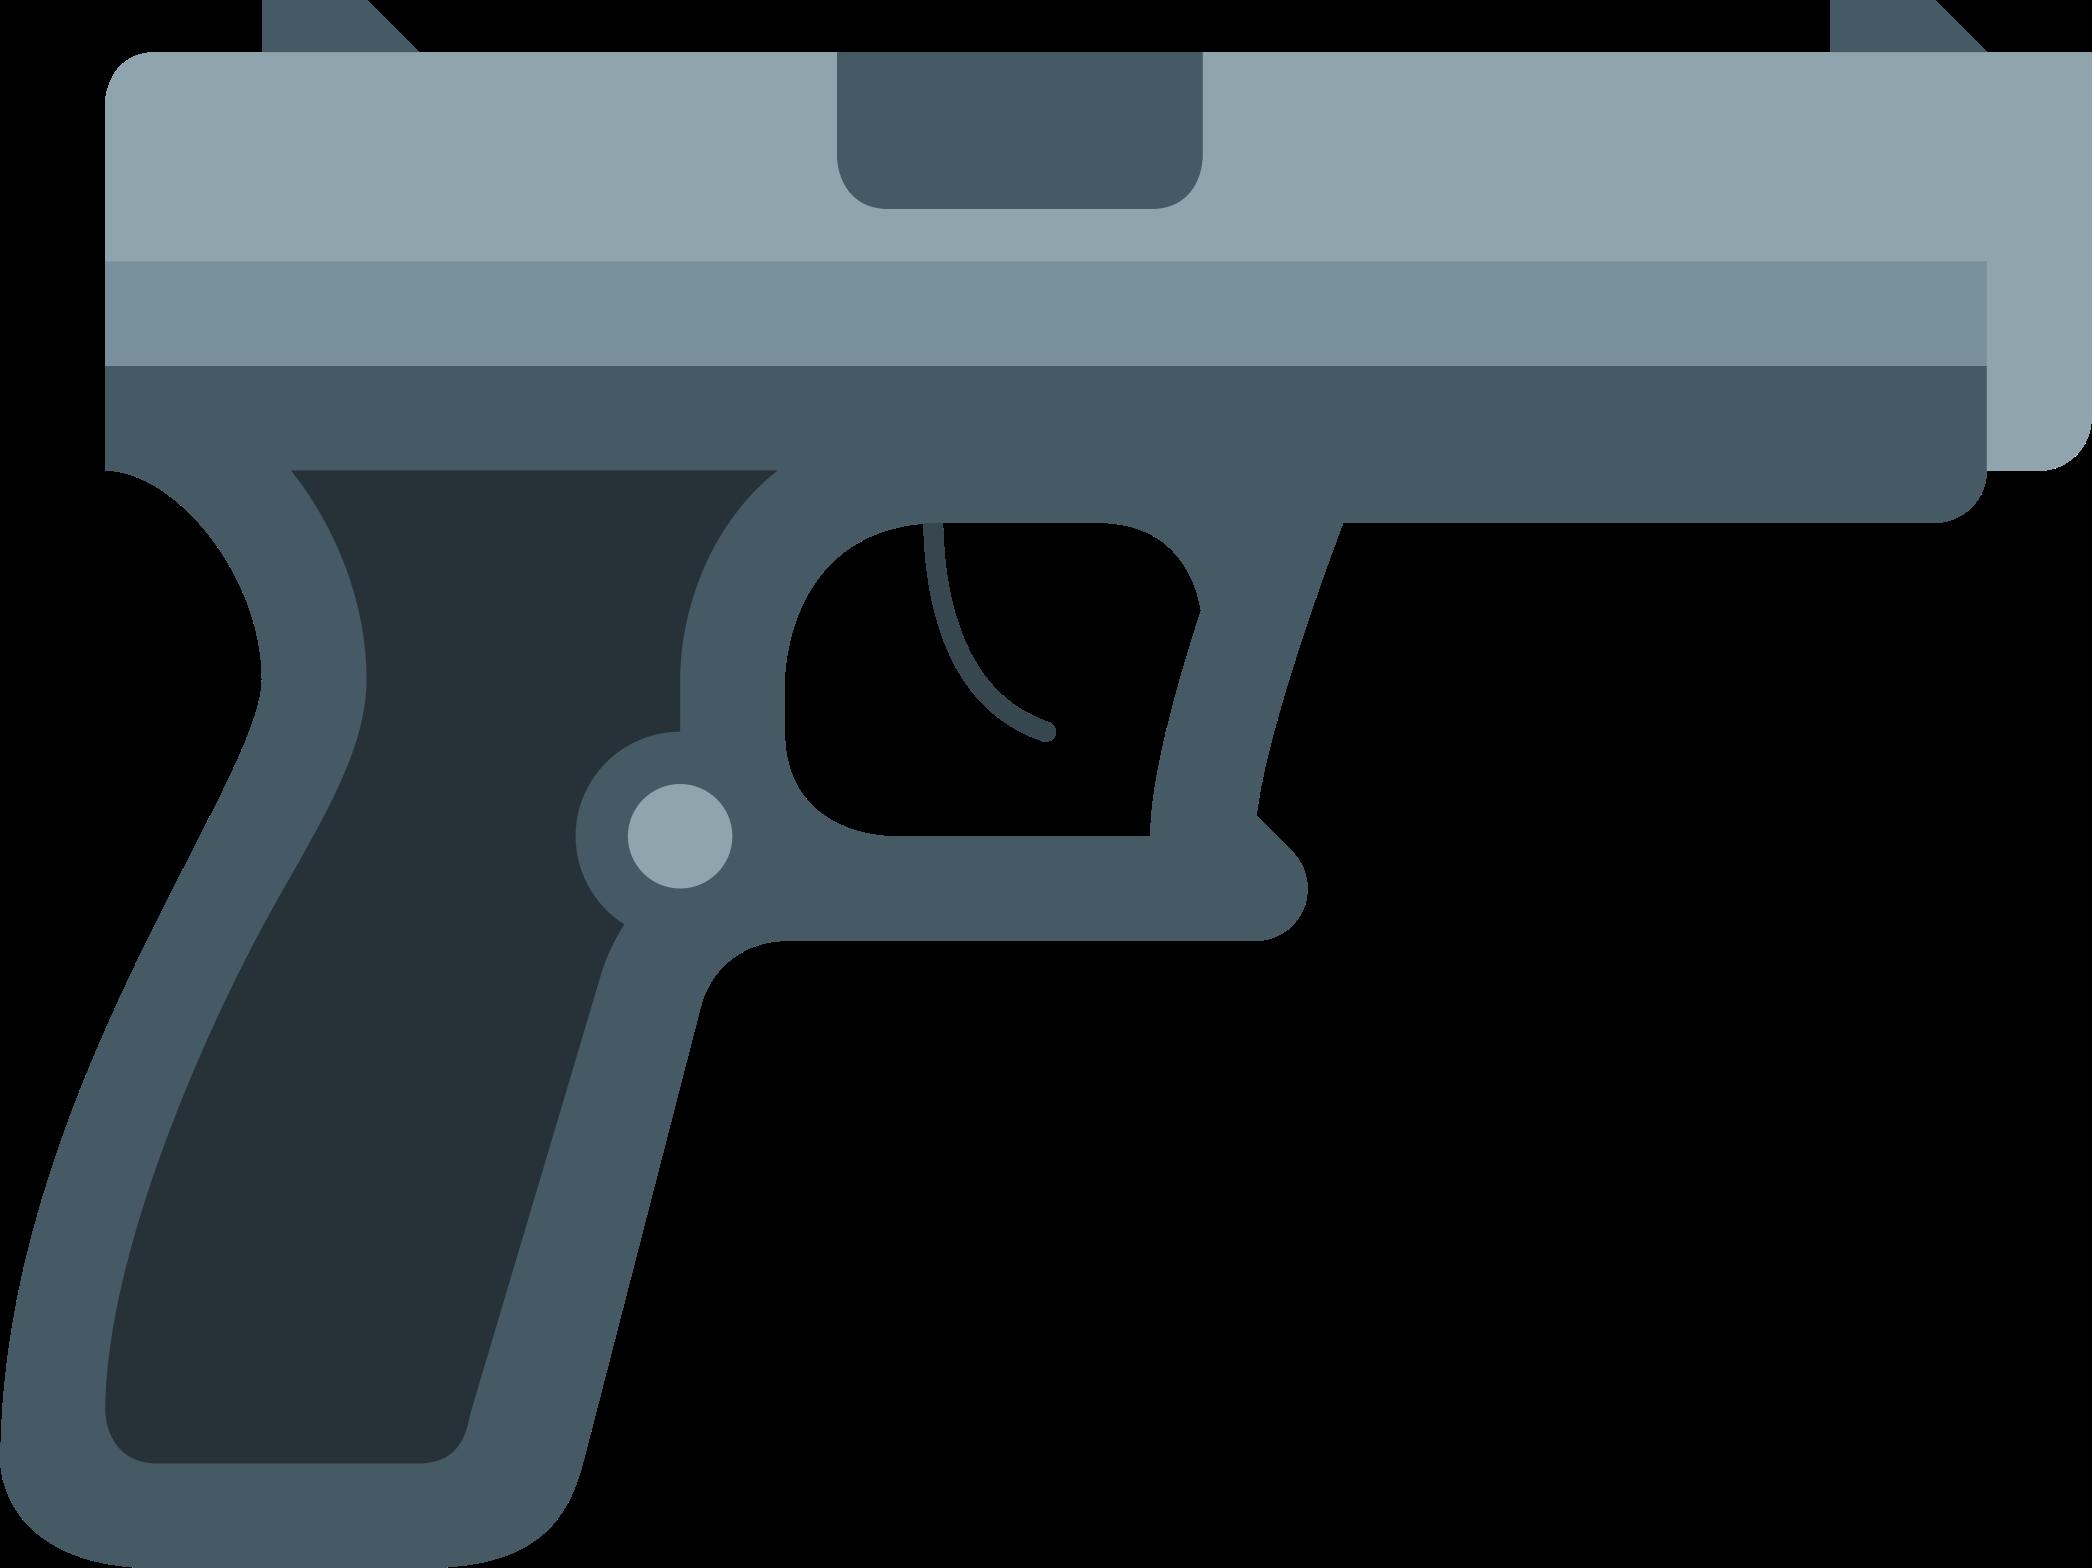 Guns clipart svg, Guns svg Transparent FREE for download on.